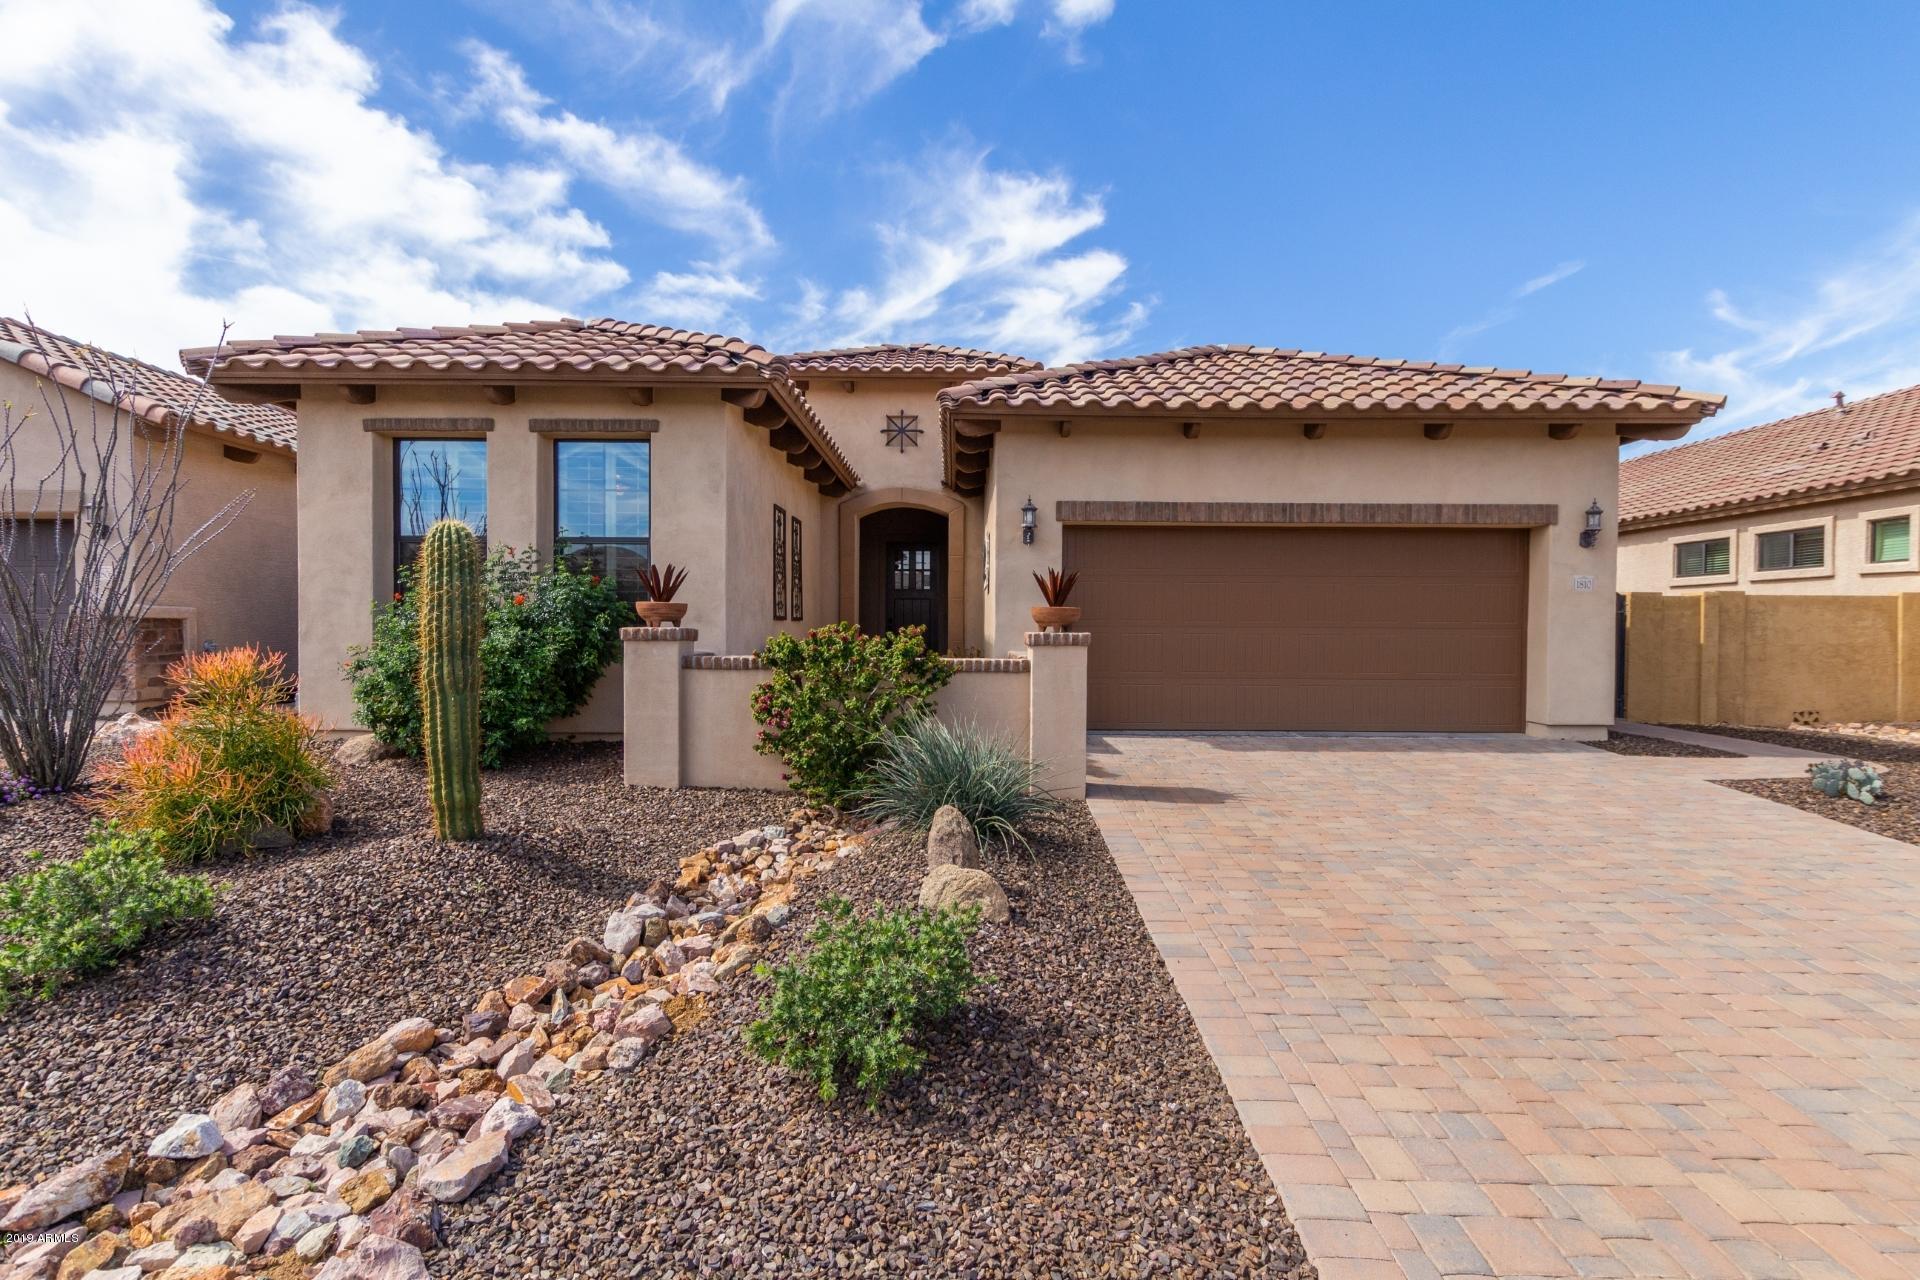 Photo of 1810 N WAVERLY --, Mesa, AZ 85207